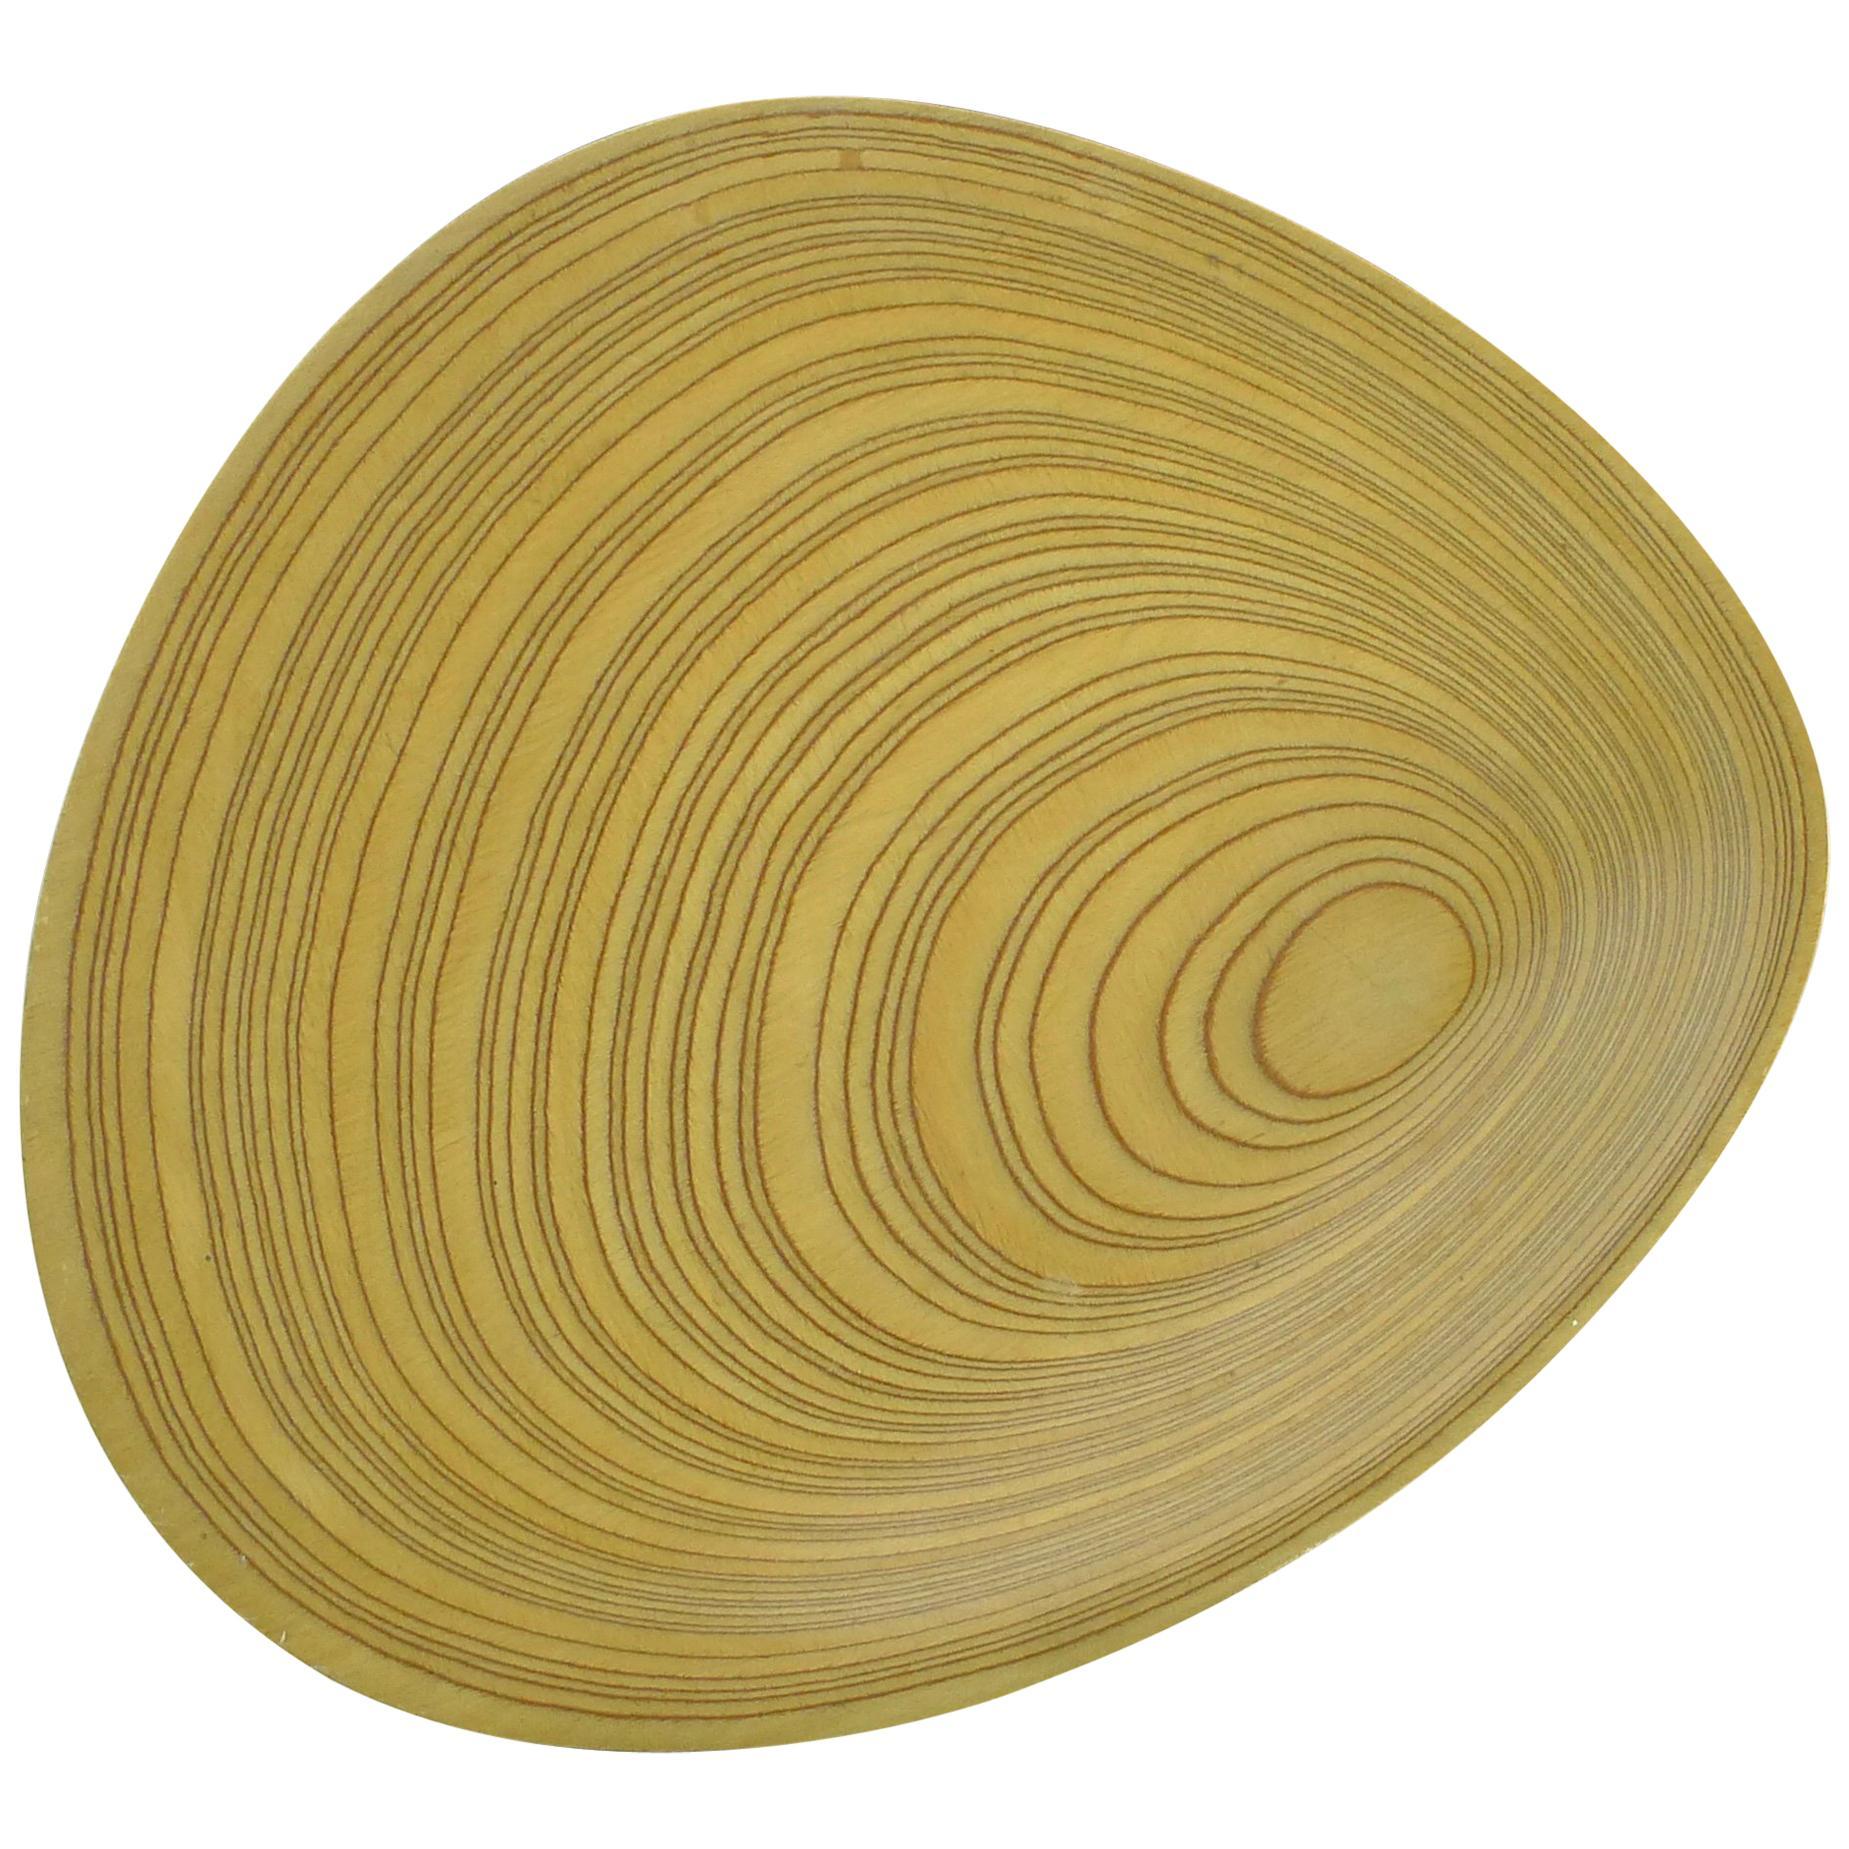 "Tapio Wirkkala Plywood ""Leaf"" Dish, Large and Signed, 1950s, Finland"